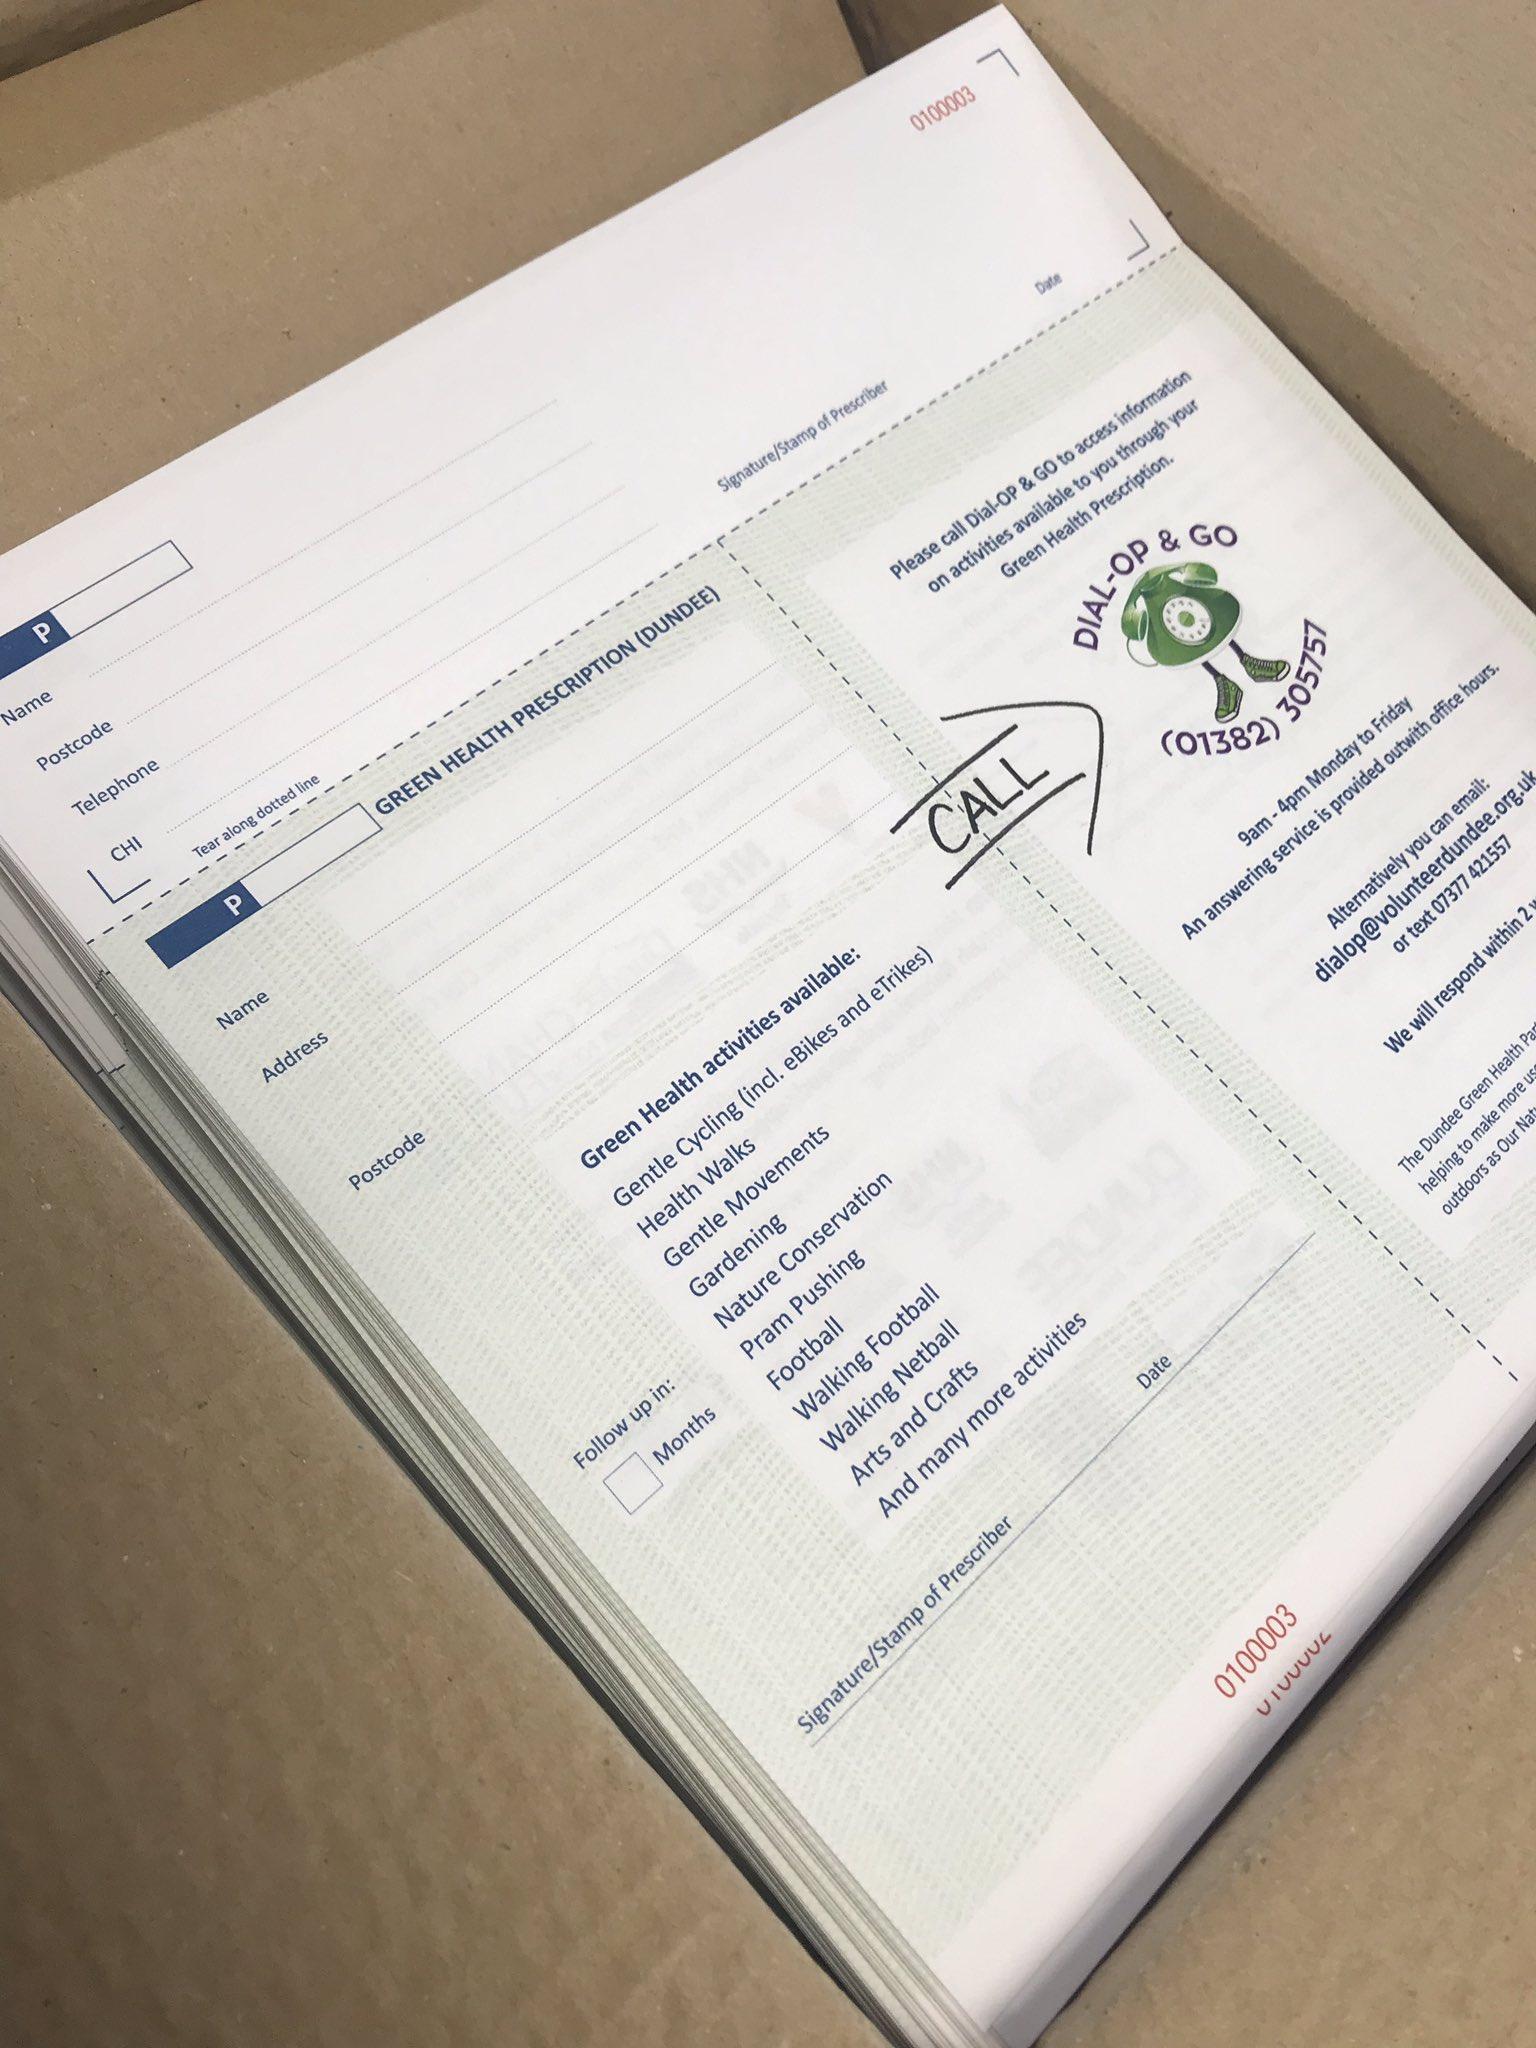 Dundee's Green Health Partnership Prescription